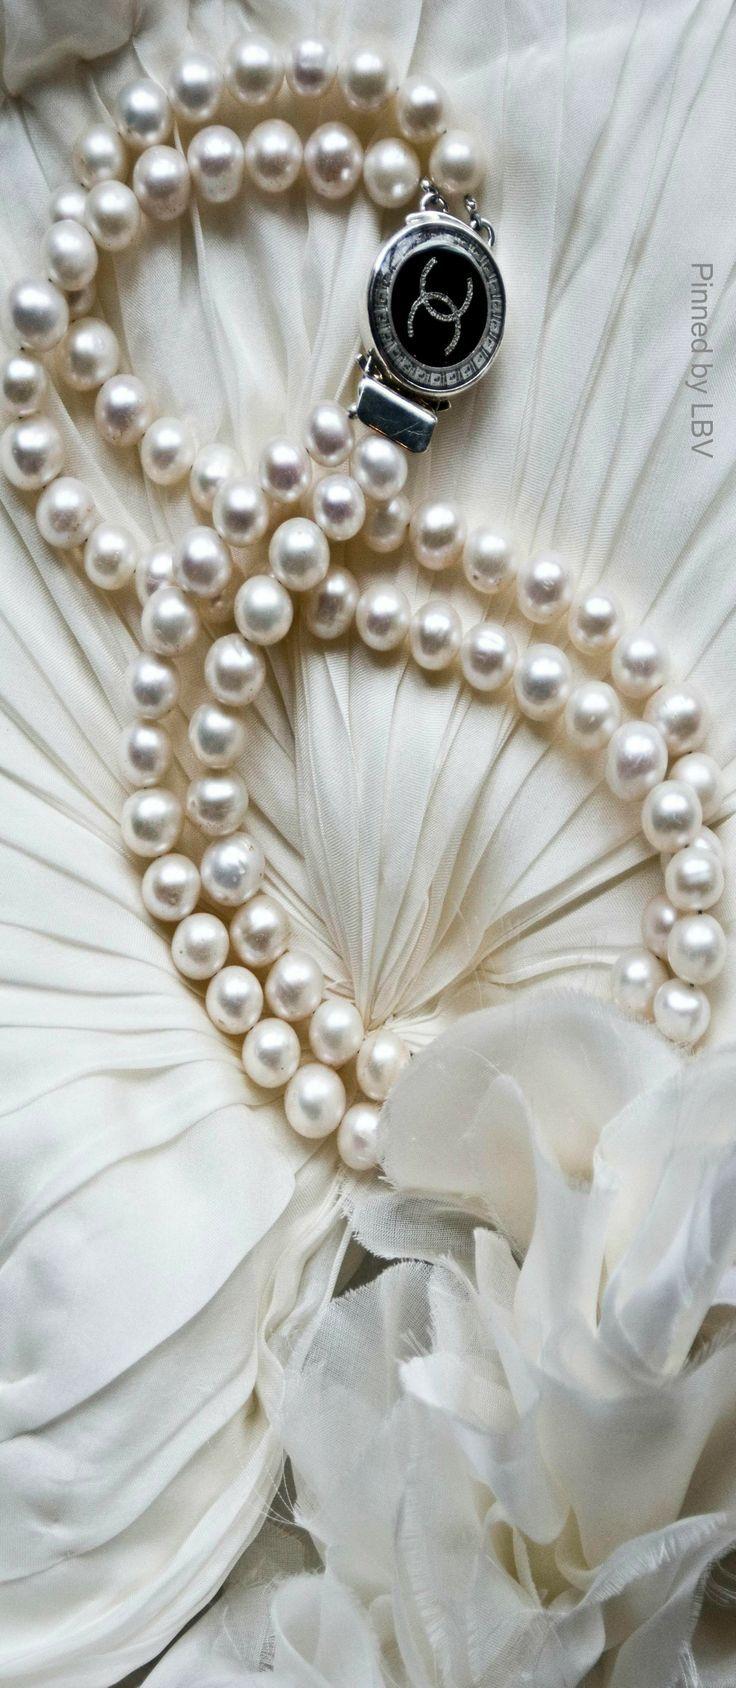 4097 best chanel jewelry images on pinterest chanel. Black Bedroom Furniture Sets. Home Design Ideas